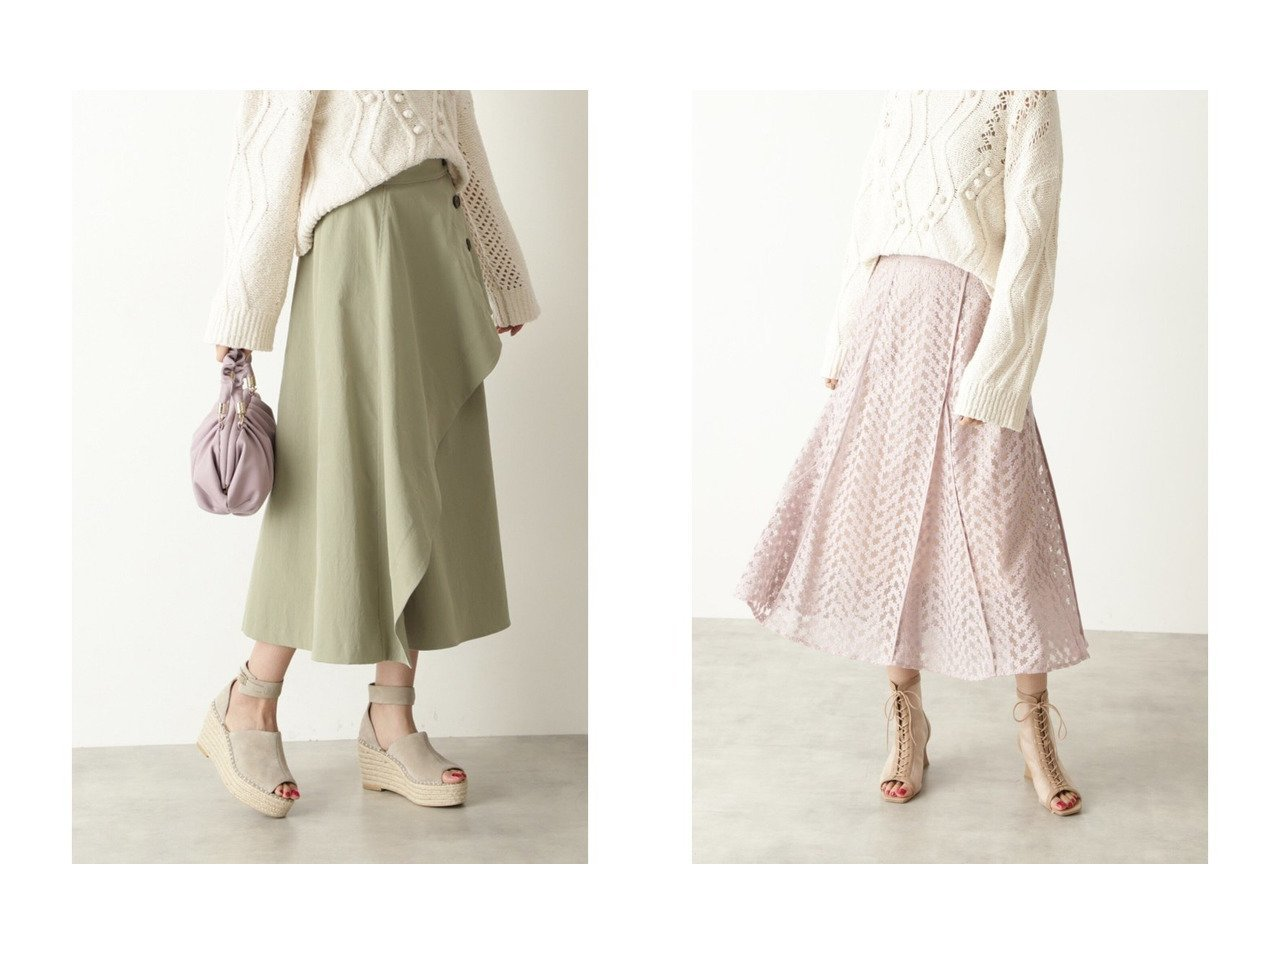 【JILLSTUART/ジルスチュアート】のロビンスカート&ミーシャスカート JILLSTUARTのおすすめ!人気、トレンド・レディースファッションの通販  おすすめで人気の流行・トレンド、ファッションの通販商品 メンズファッション・キッズファッション・インテリア・家具・レディースファッション・服の通販 founy(ファニー) https://founy.com/ ファッション Fashion レディースファッション WOMEN スカート Skirt NEW・新作・新着・新入荷 New Arrivals フレア ミドル ロング 再入荷 Restock/Back in Stock/Re Arrival |ID:crp329100000017806